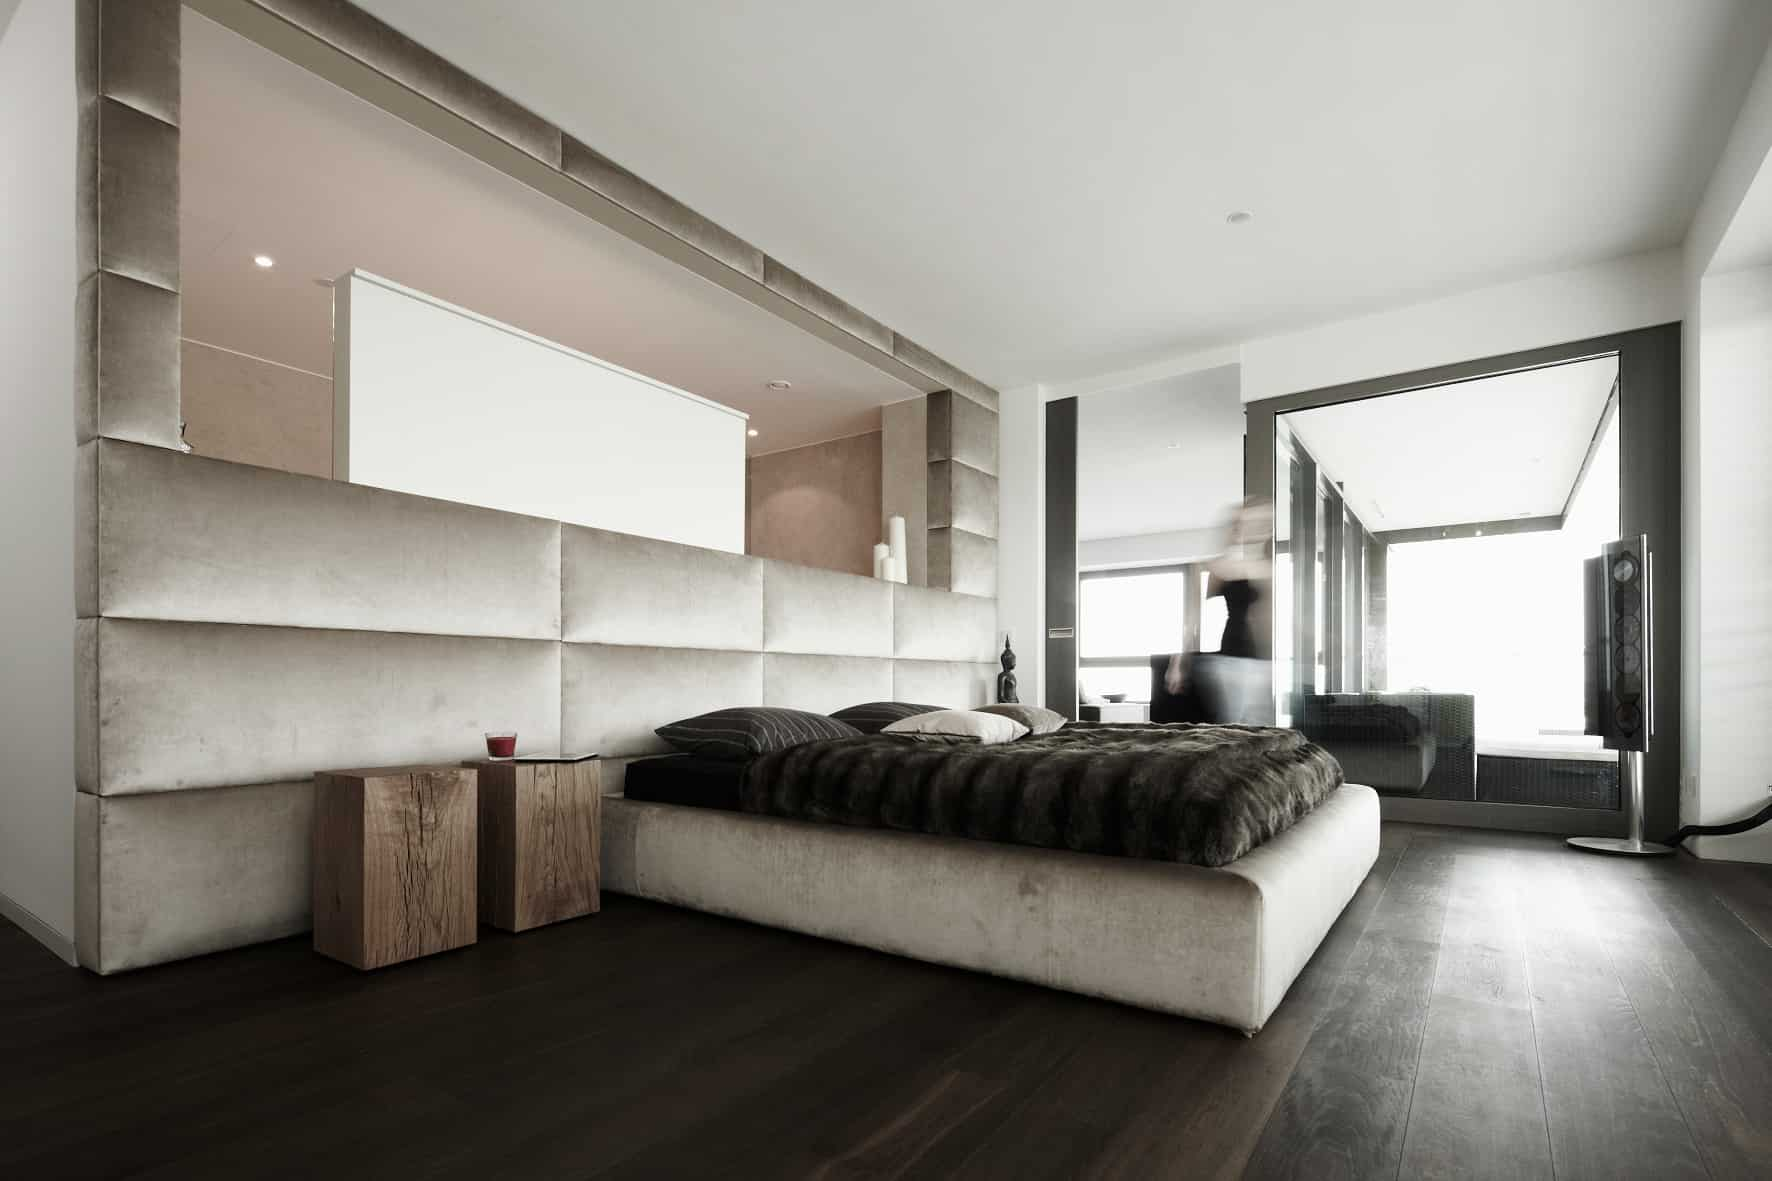 eggersmann shelving and hideaway shelving create a clutter free modern luxury bedroom